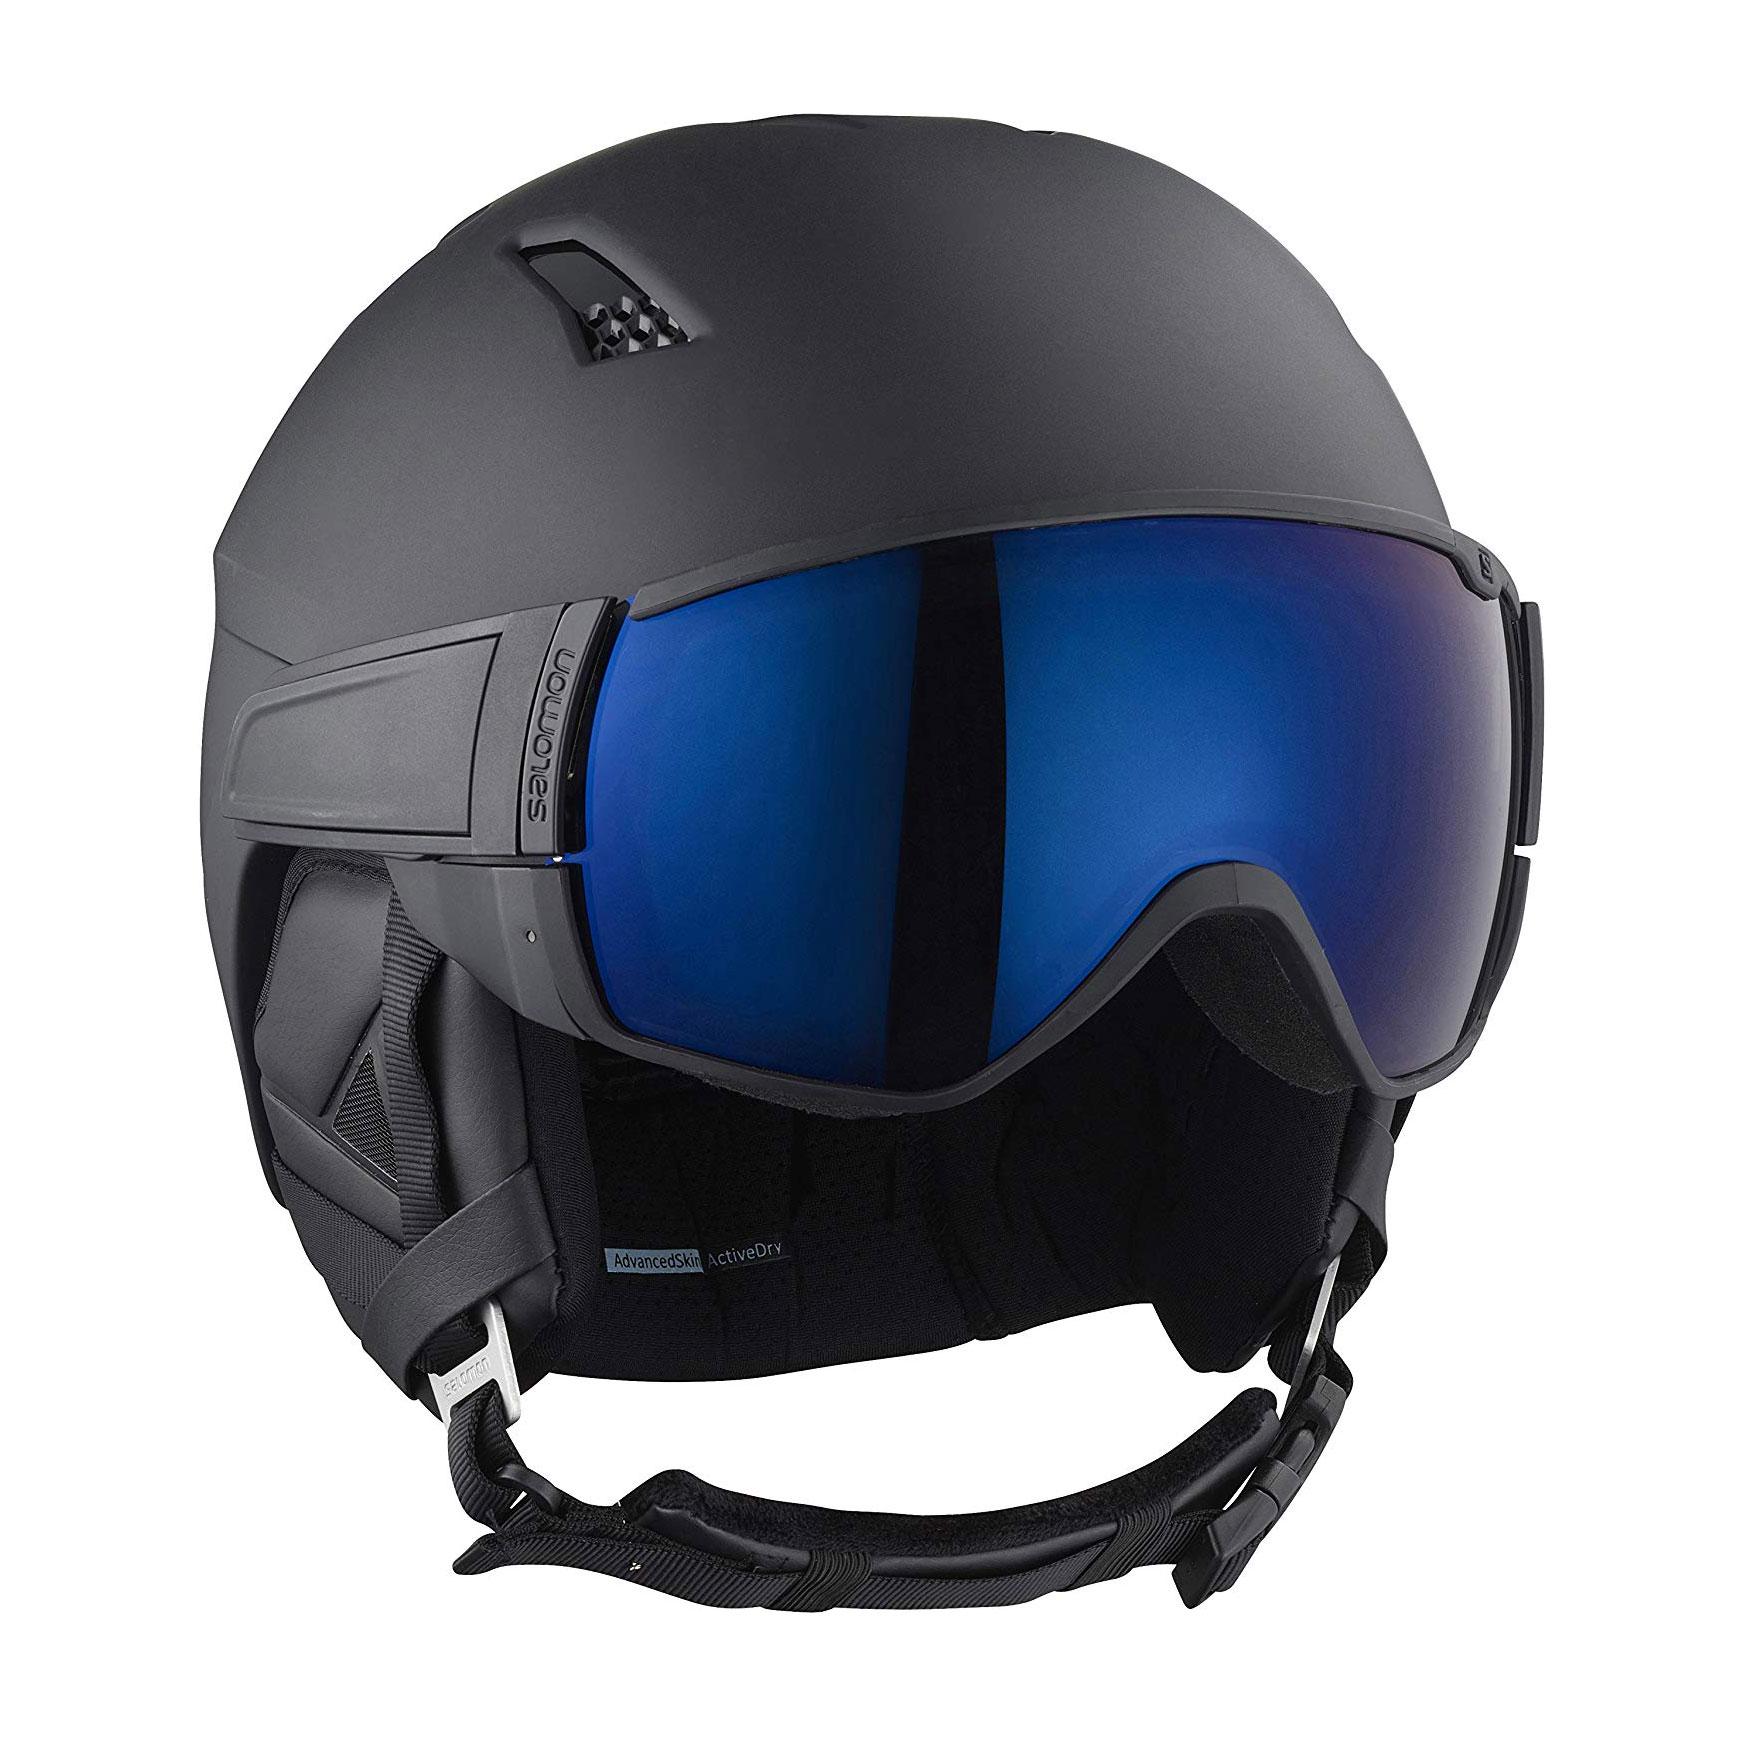 4db9e8a0 Details about Salomon Driver S Men and Women's Black Ski Snowboard Visor  Helmet, Size Small